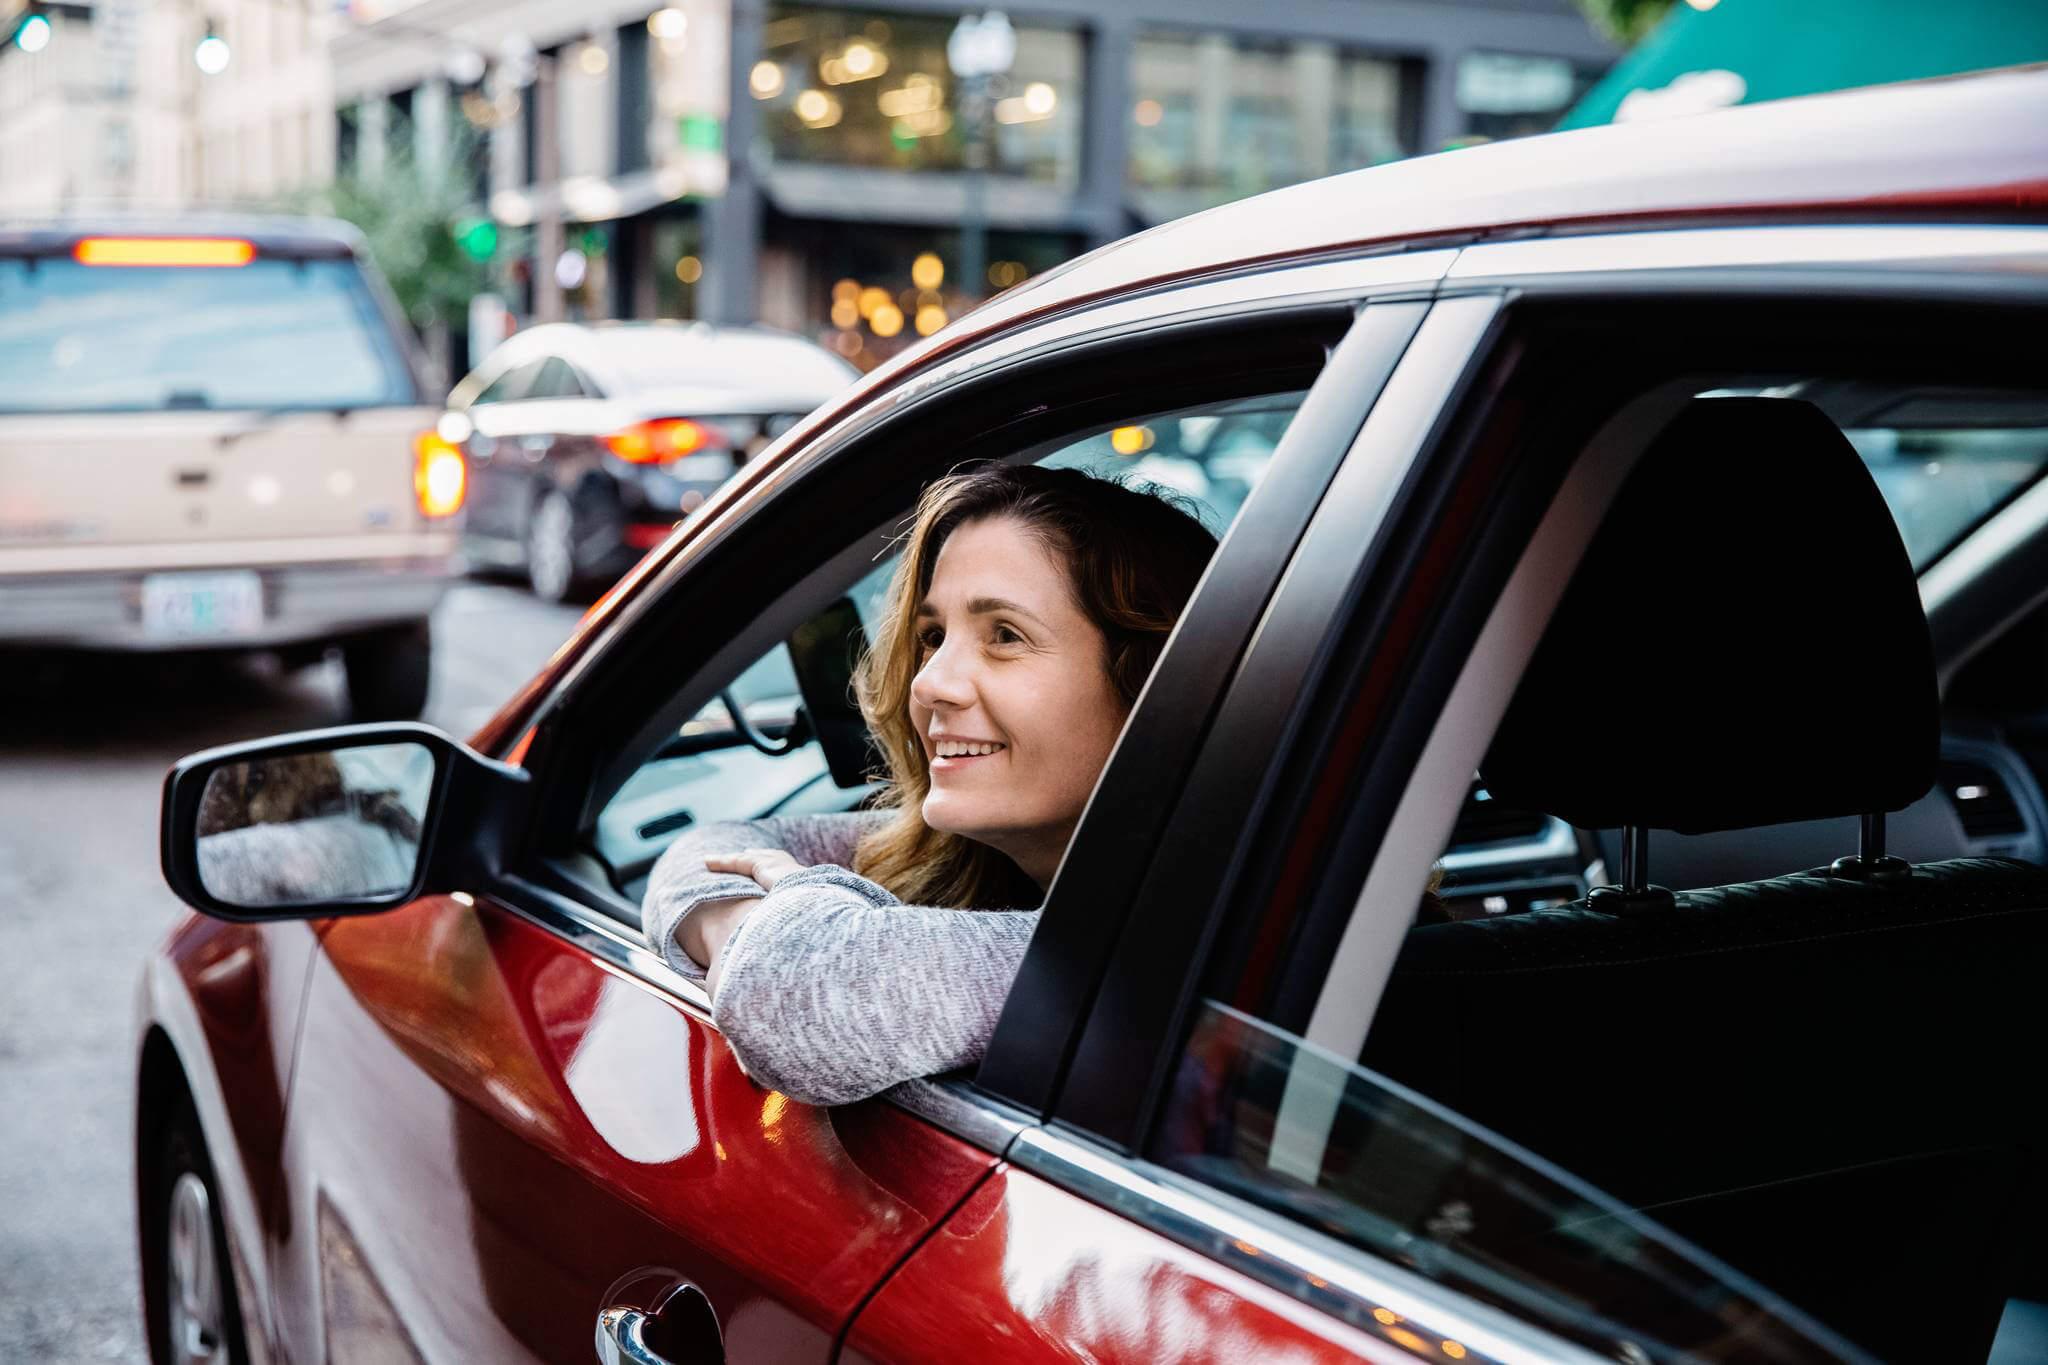 uber-driver-app-photo-1